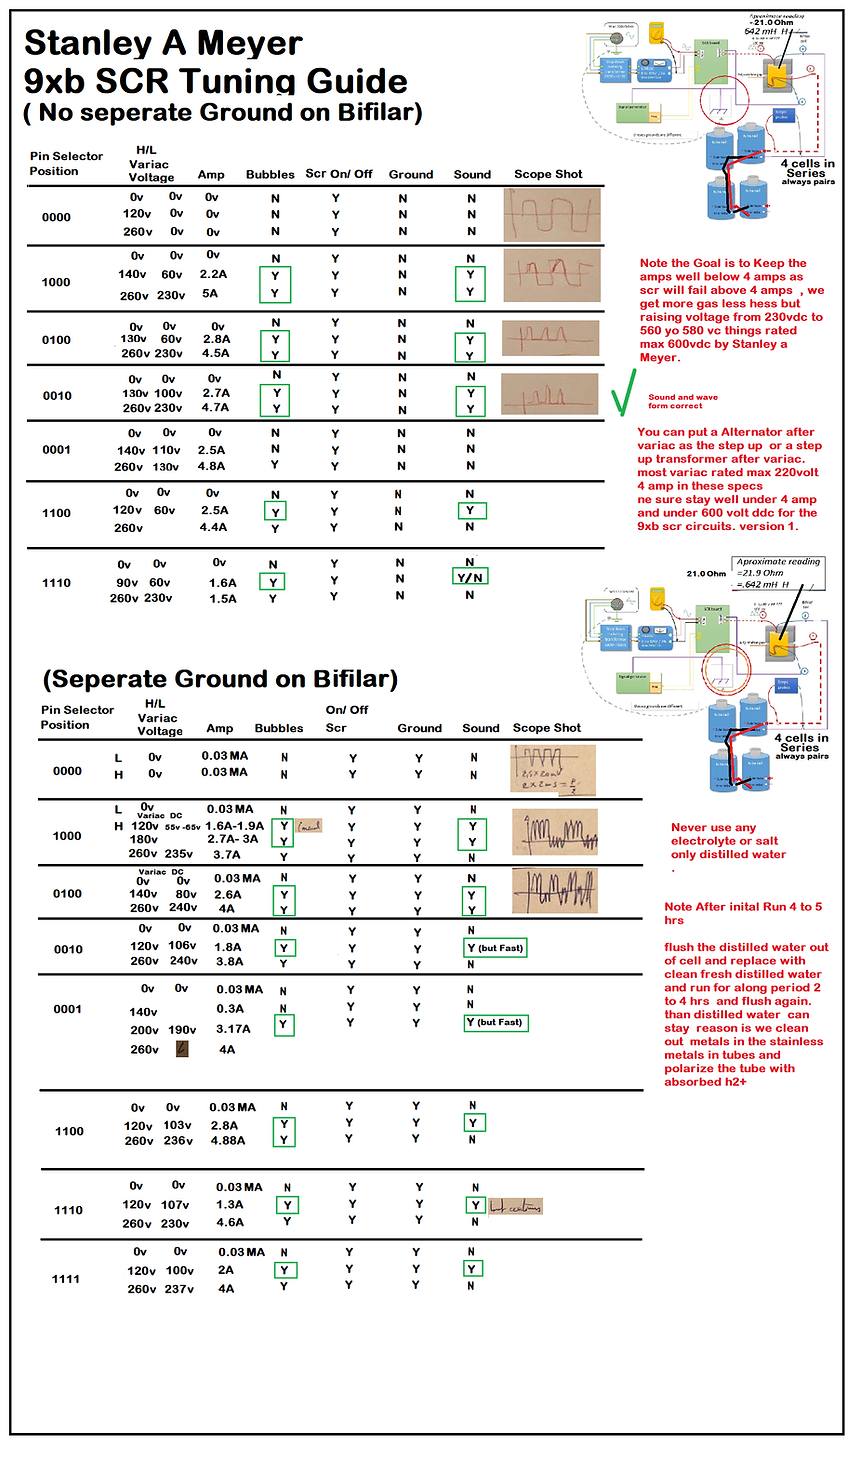 Stanley A Meyer 9xb WFC Circuit SCR Test